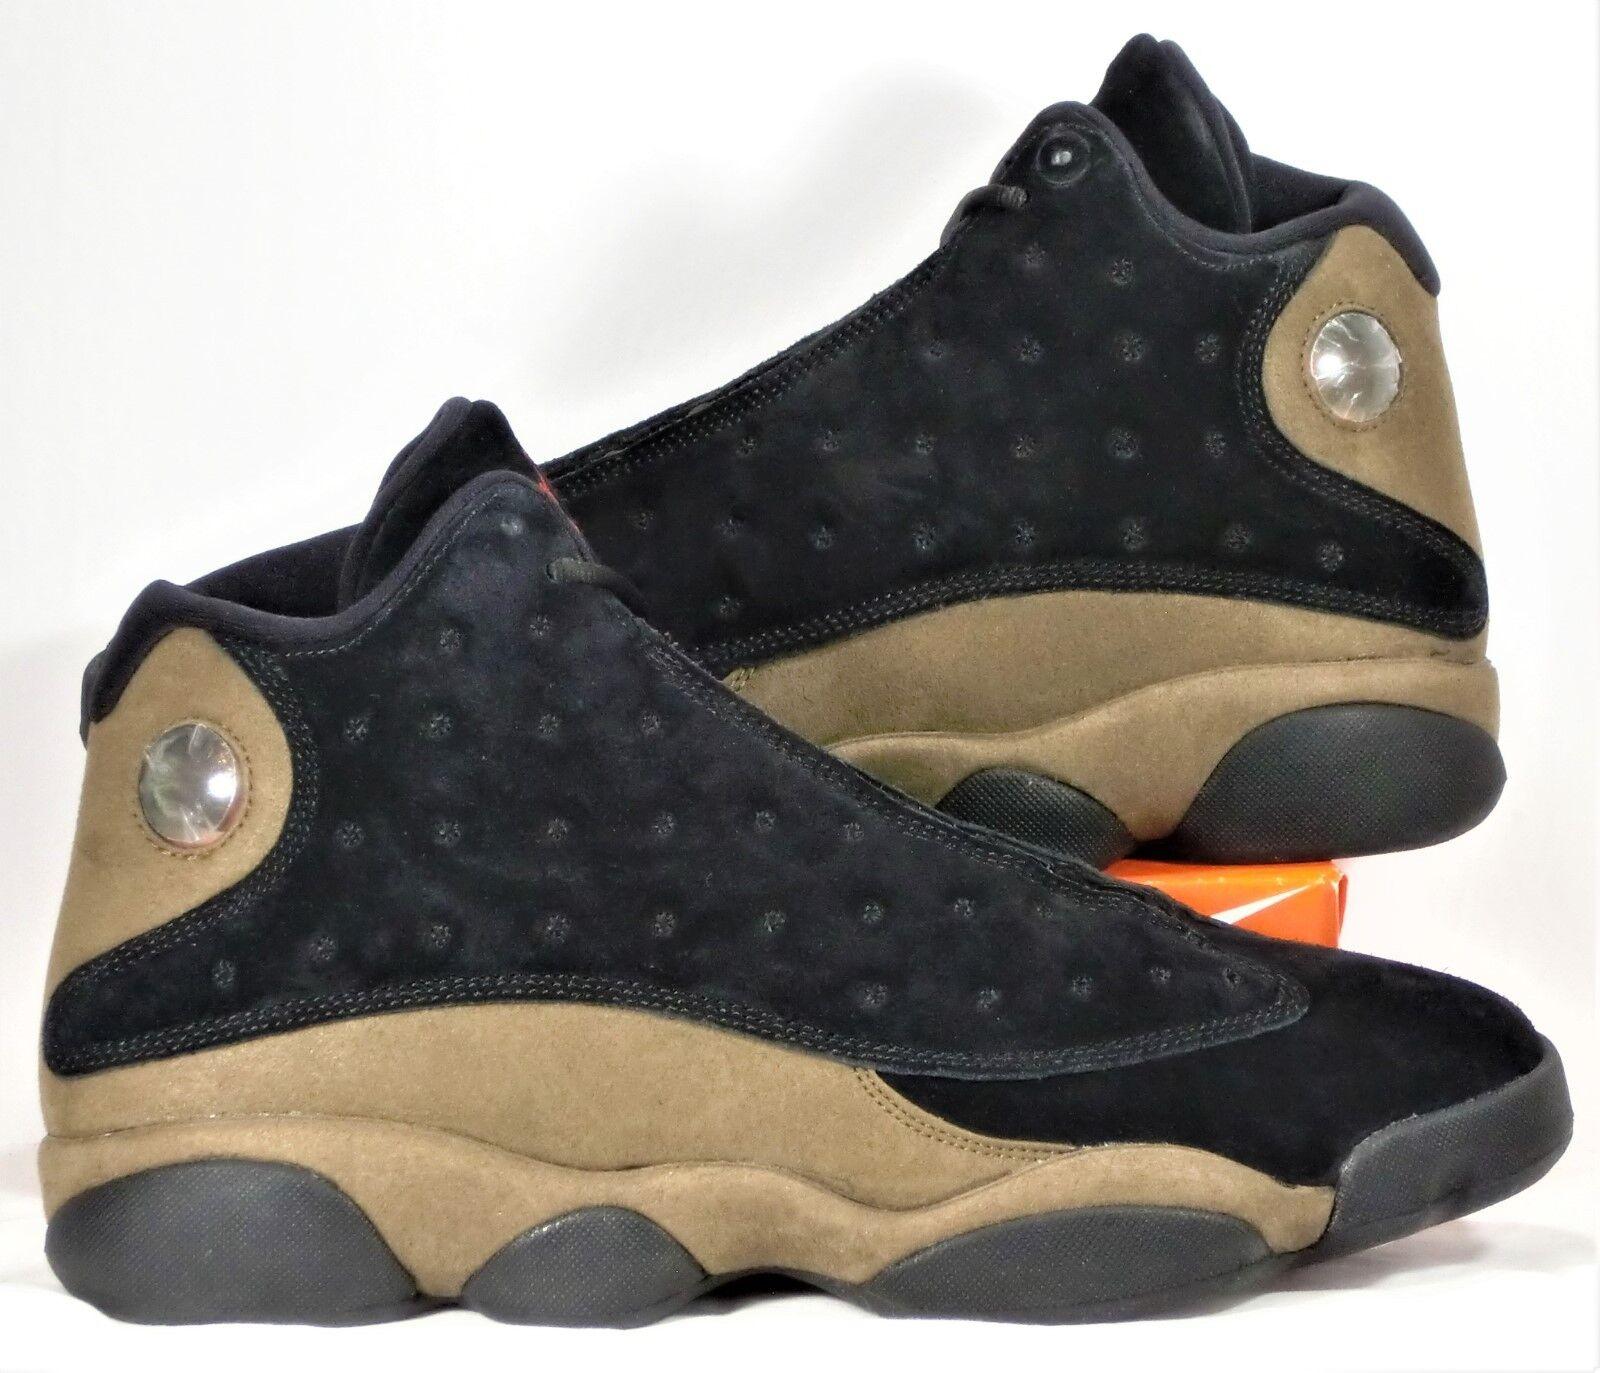 Nike Air Jordan 13 XIII Retro Black & Gym Red & Olive Sz 12.5 NEW 414571 006